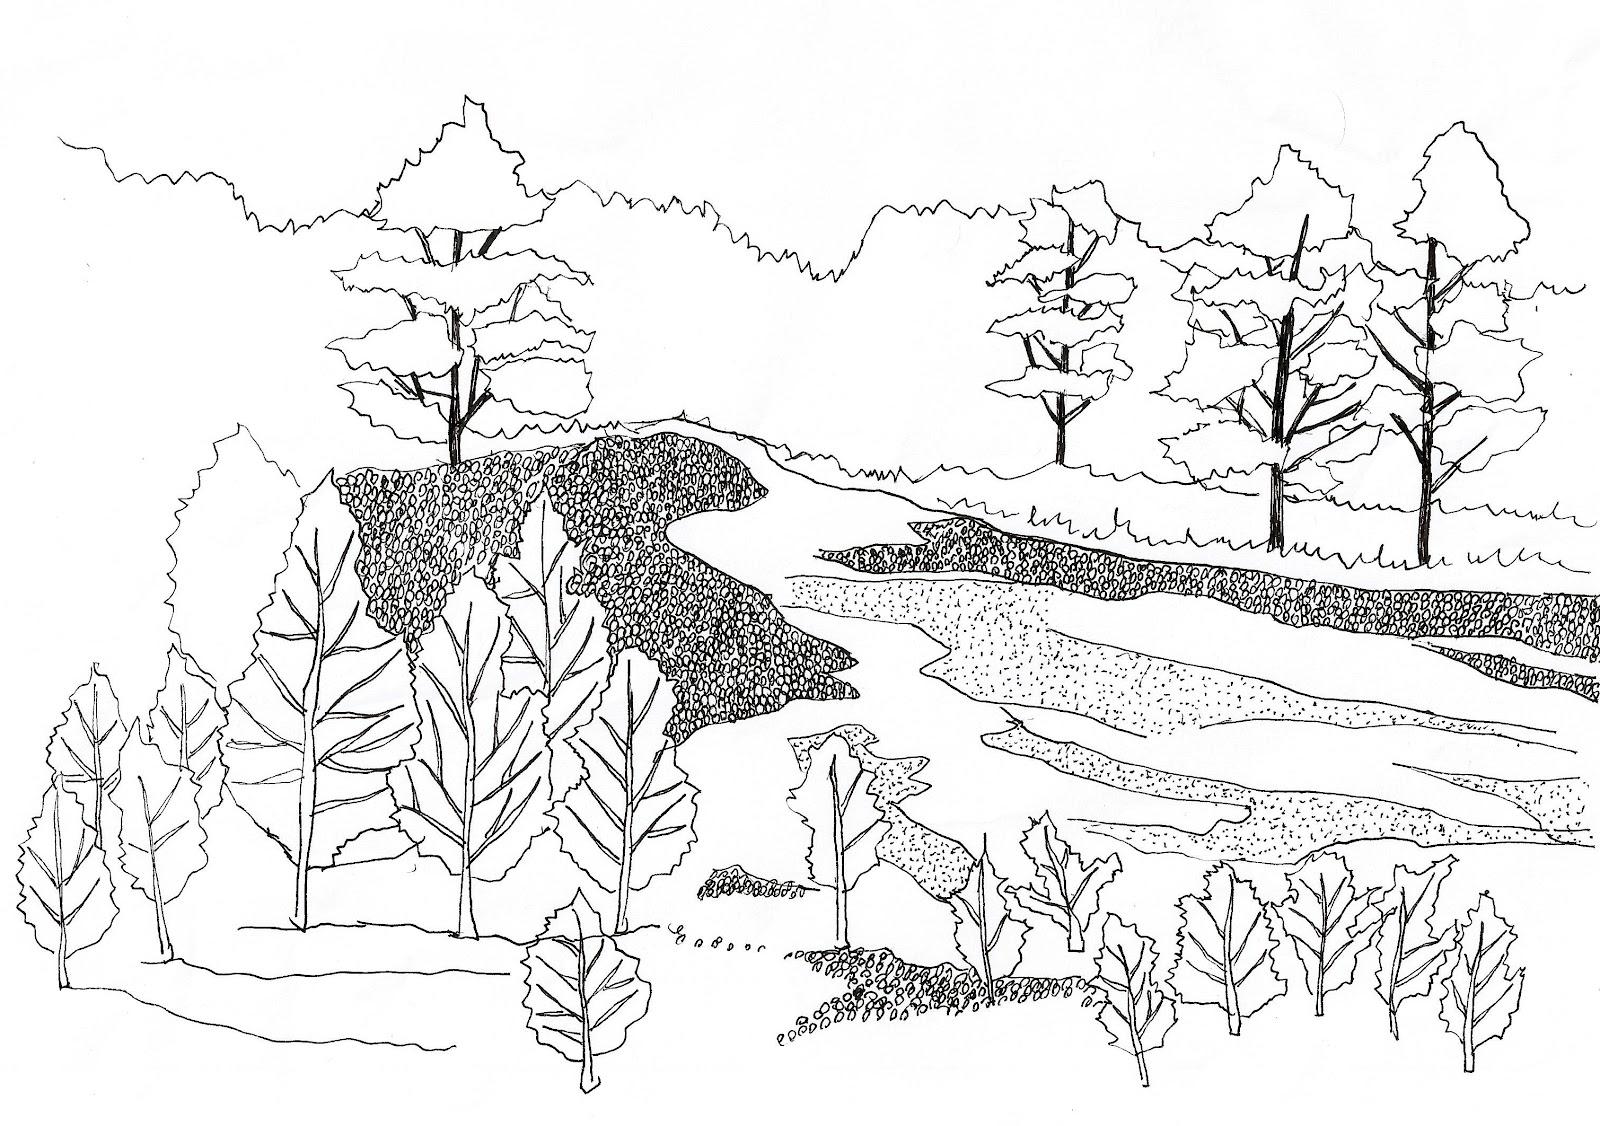 1600x1126 P2x2 Site Sketch Chorographic Response